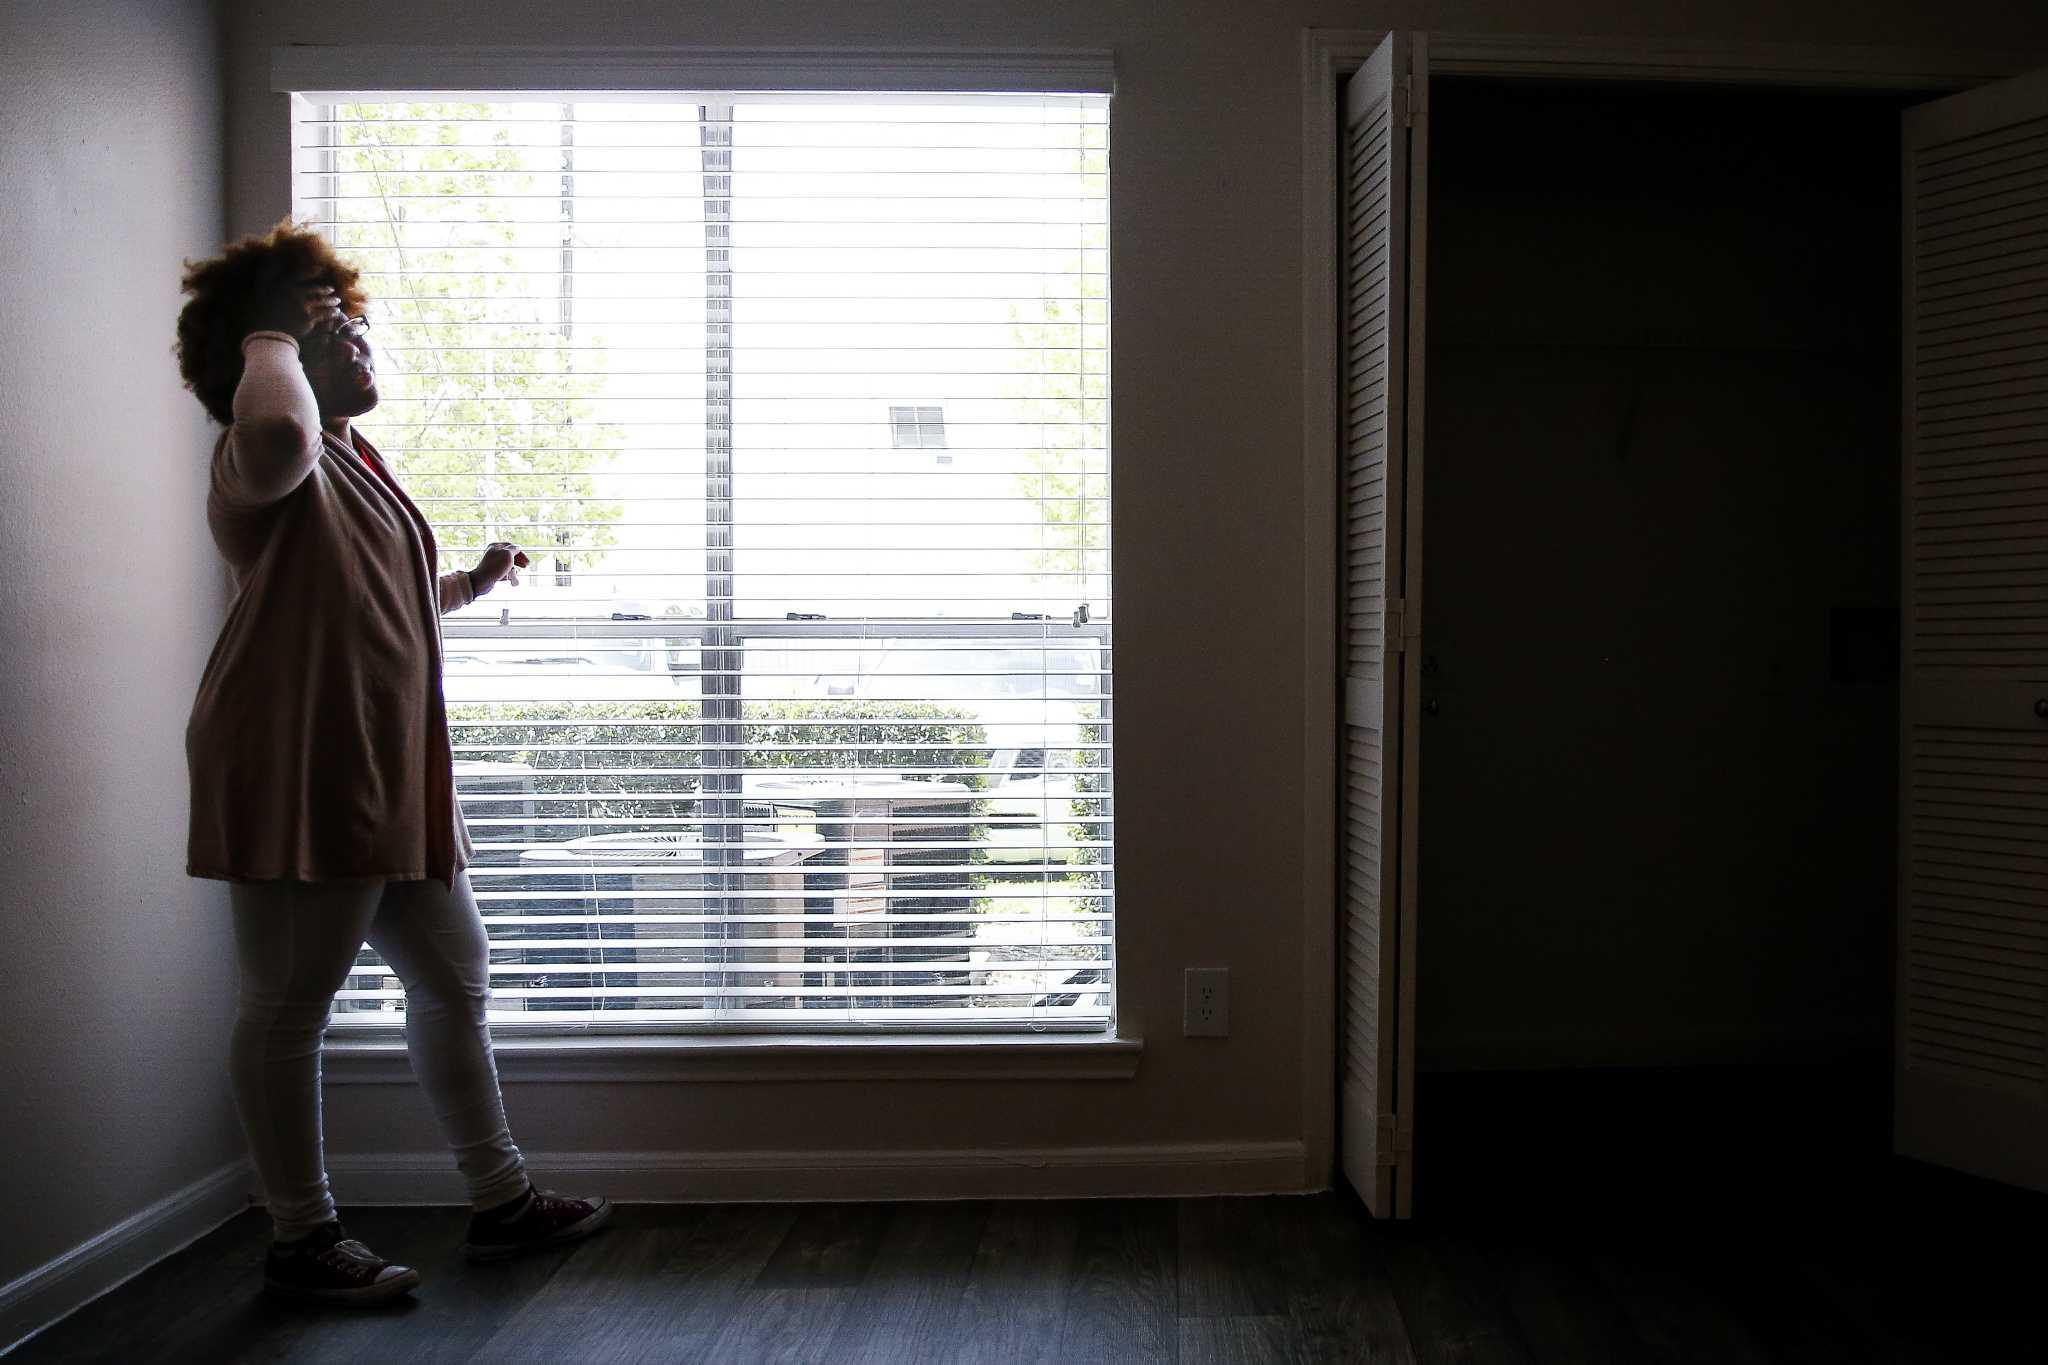 revoked vouchers leave housing dreams uncertain - houston chronicle